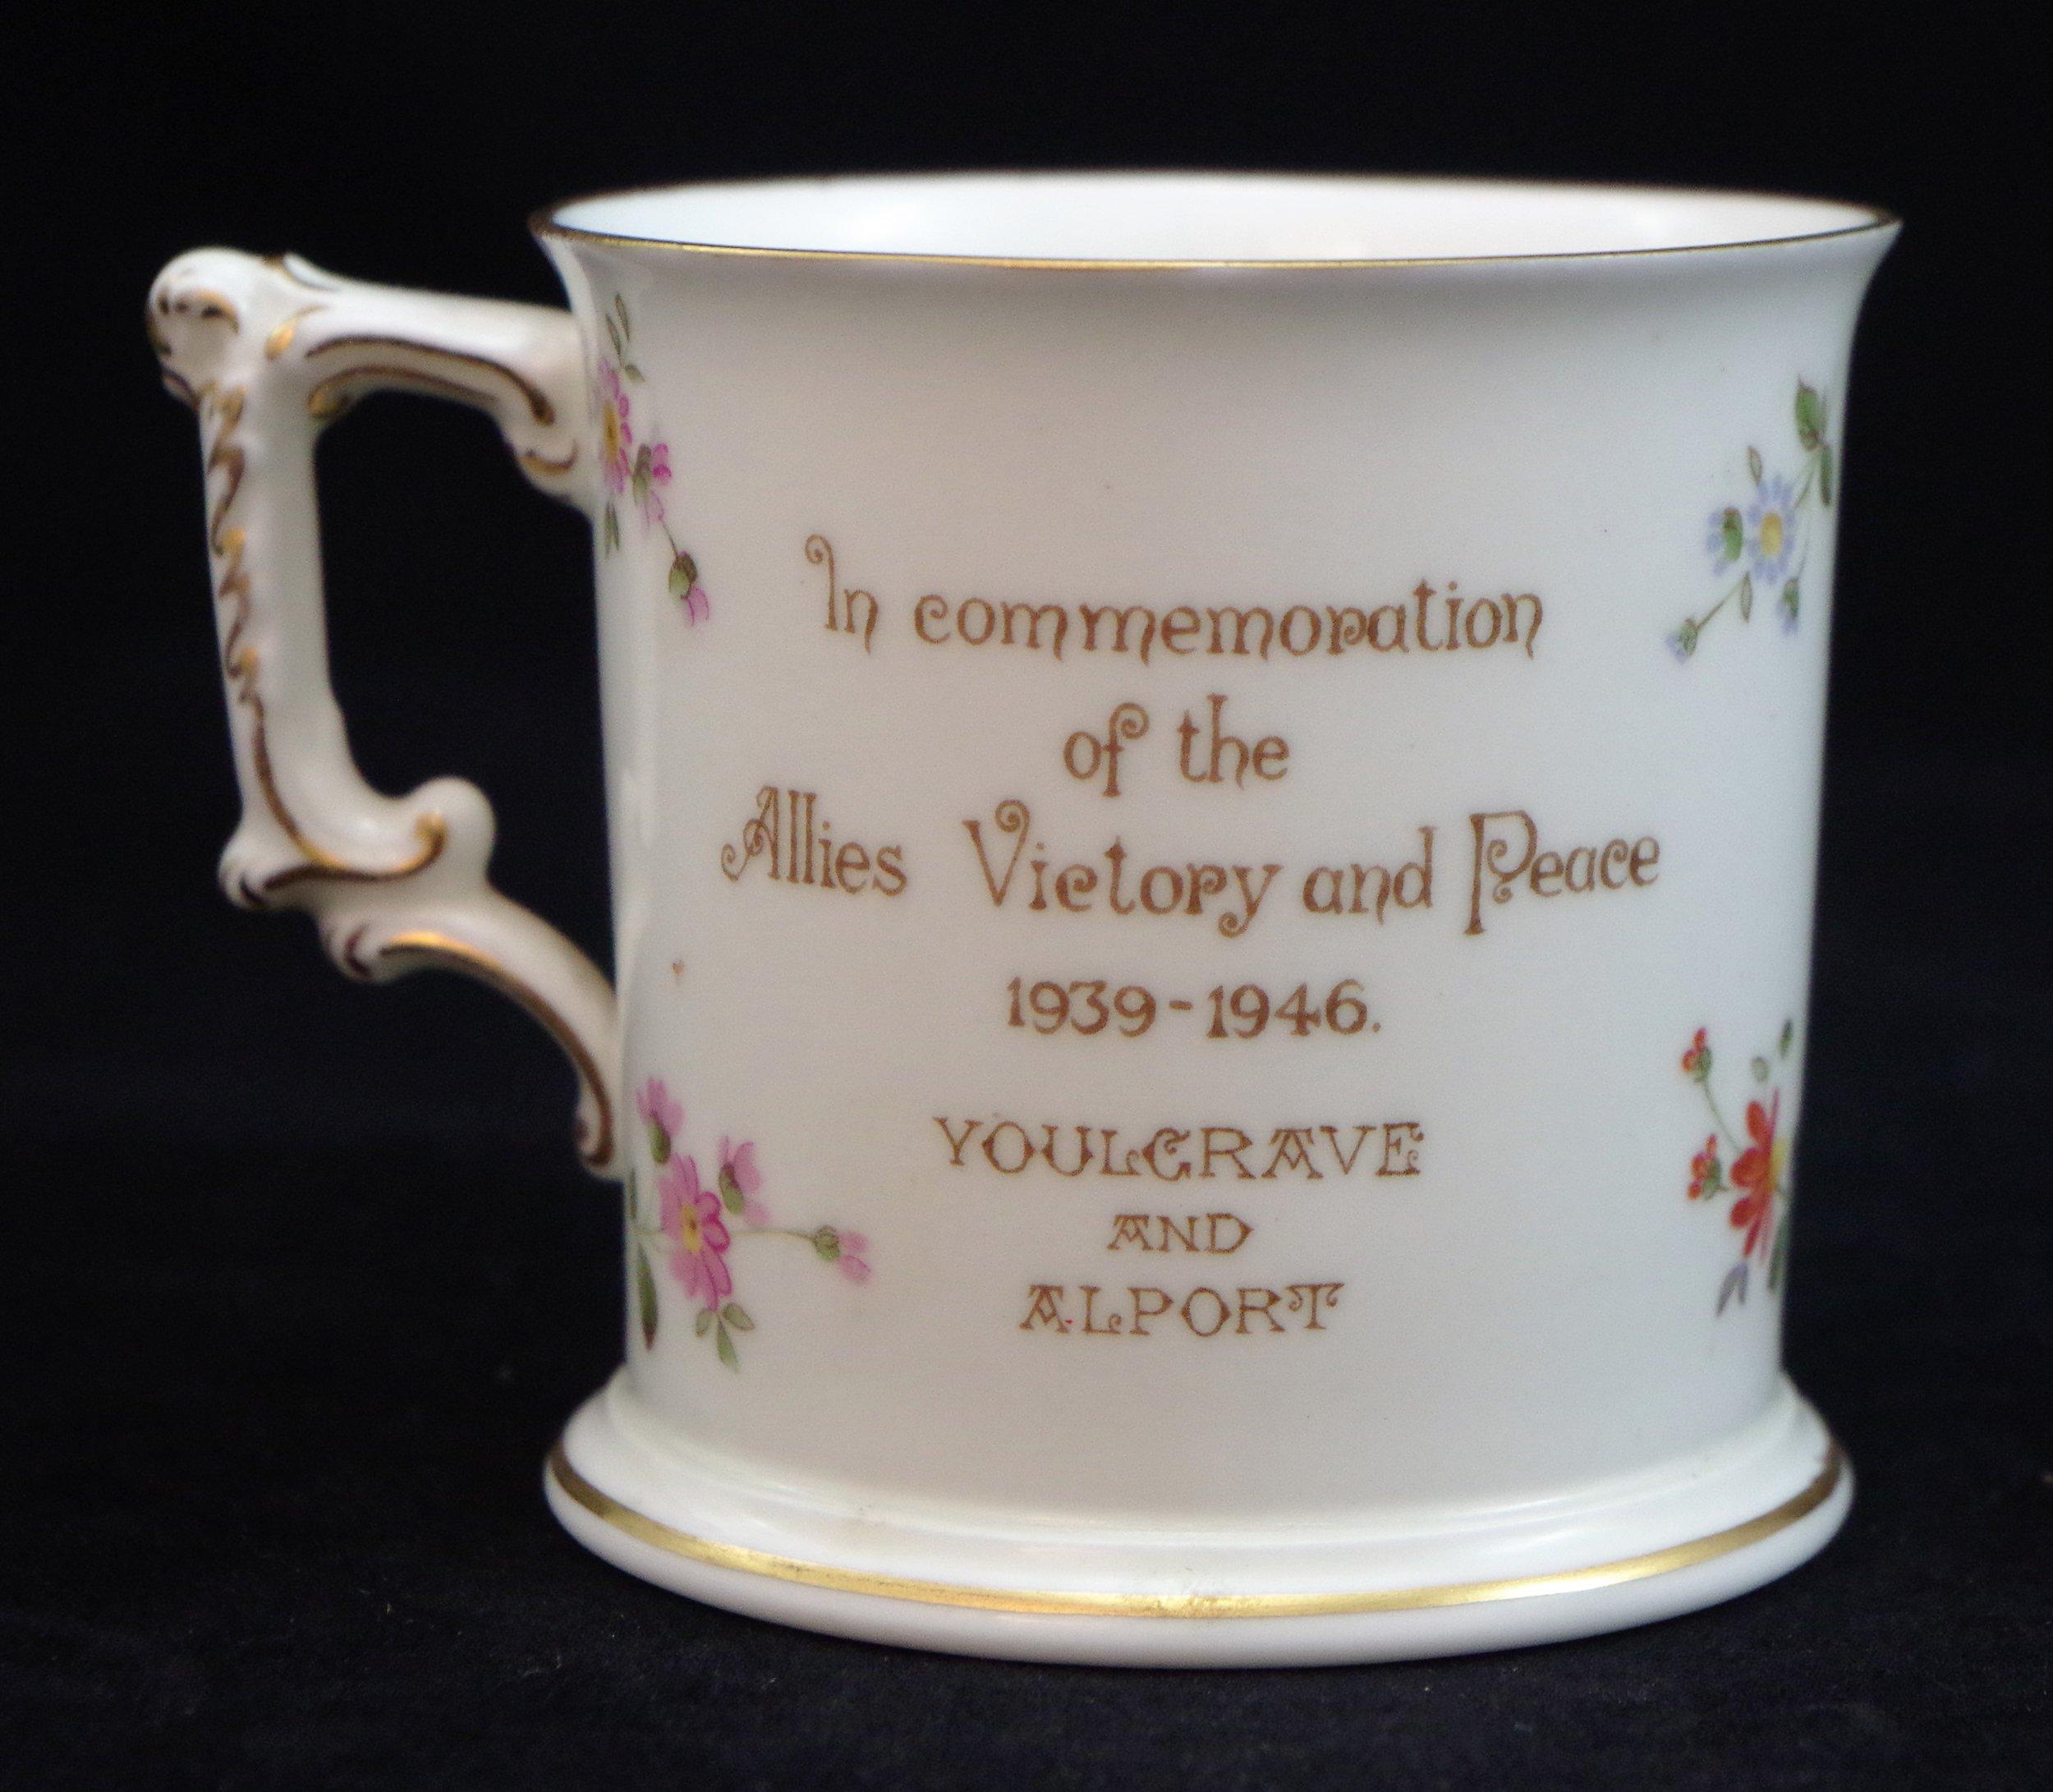 royal-crown-derby-mug-derby-posie-A228-youlgrave-and-alport-reverse